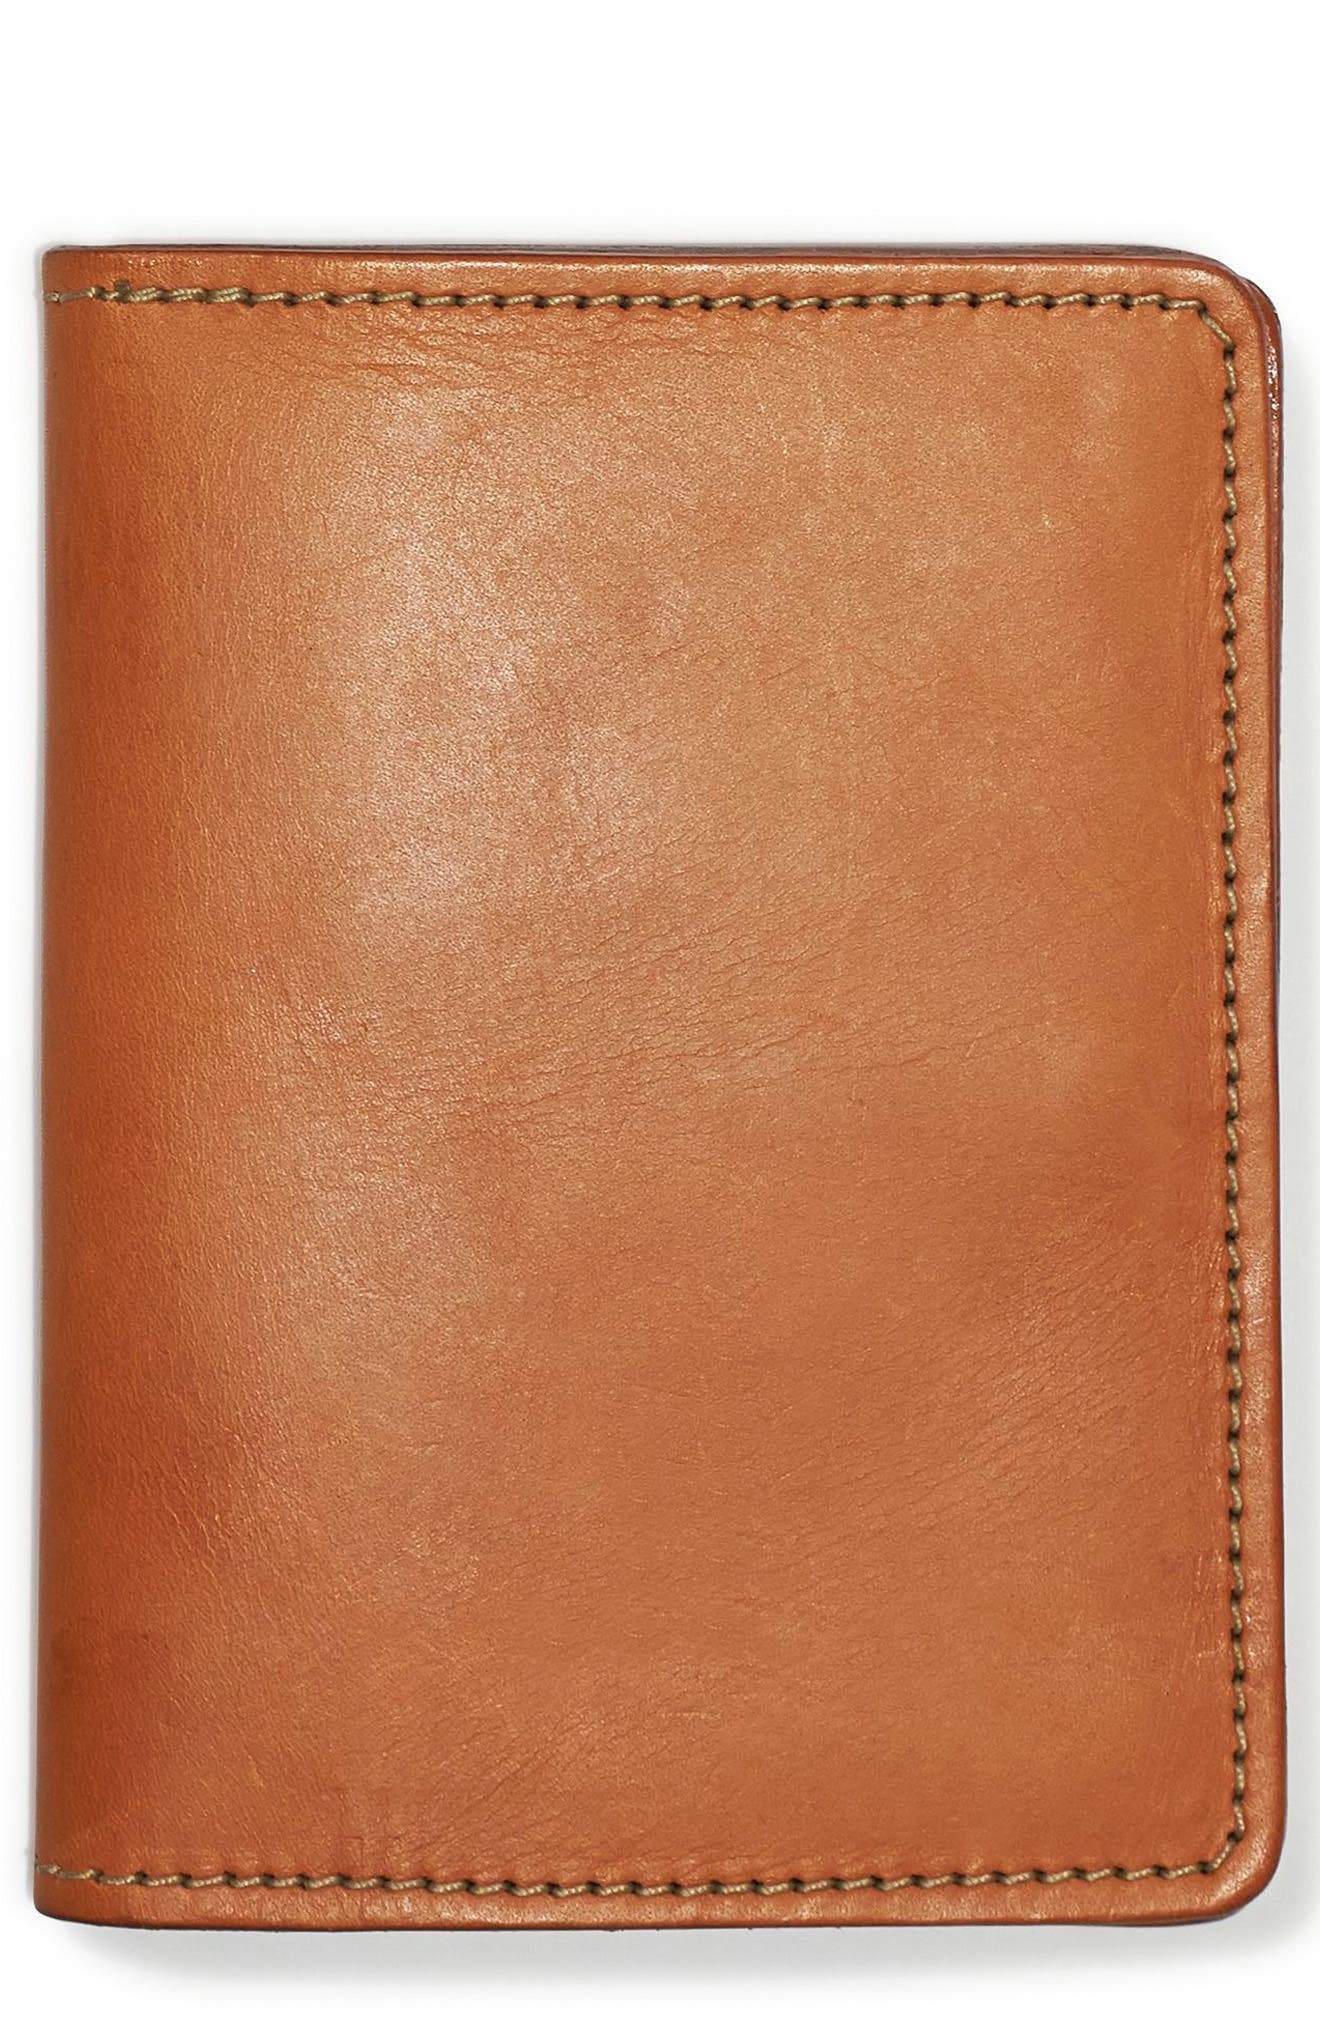 Alternate Image 1 Selected - Filson Leather Passport Case